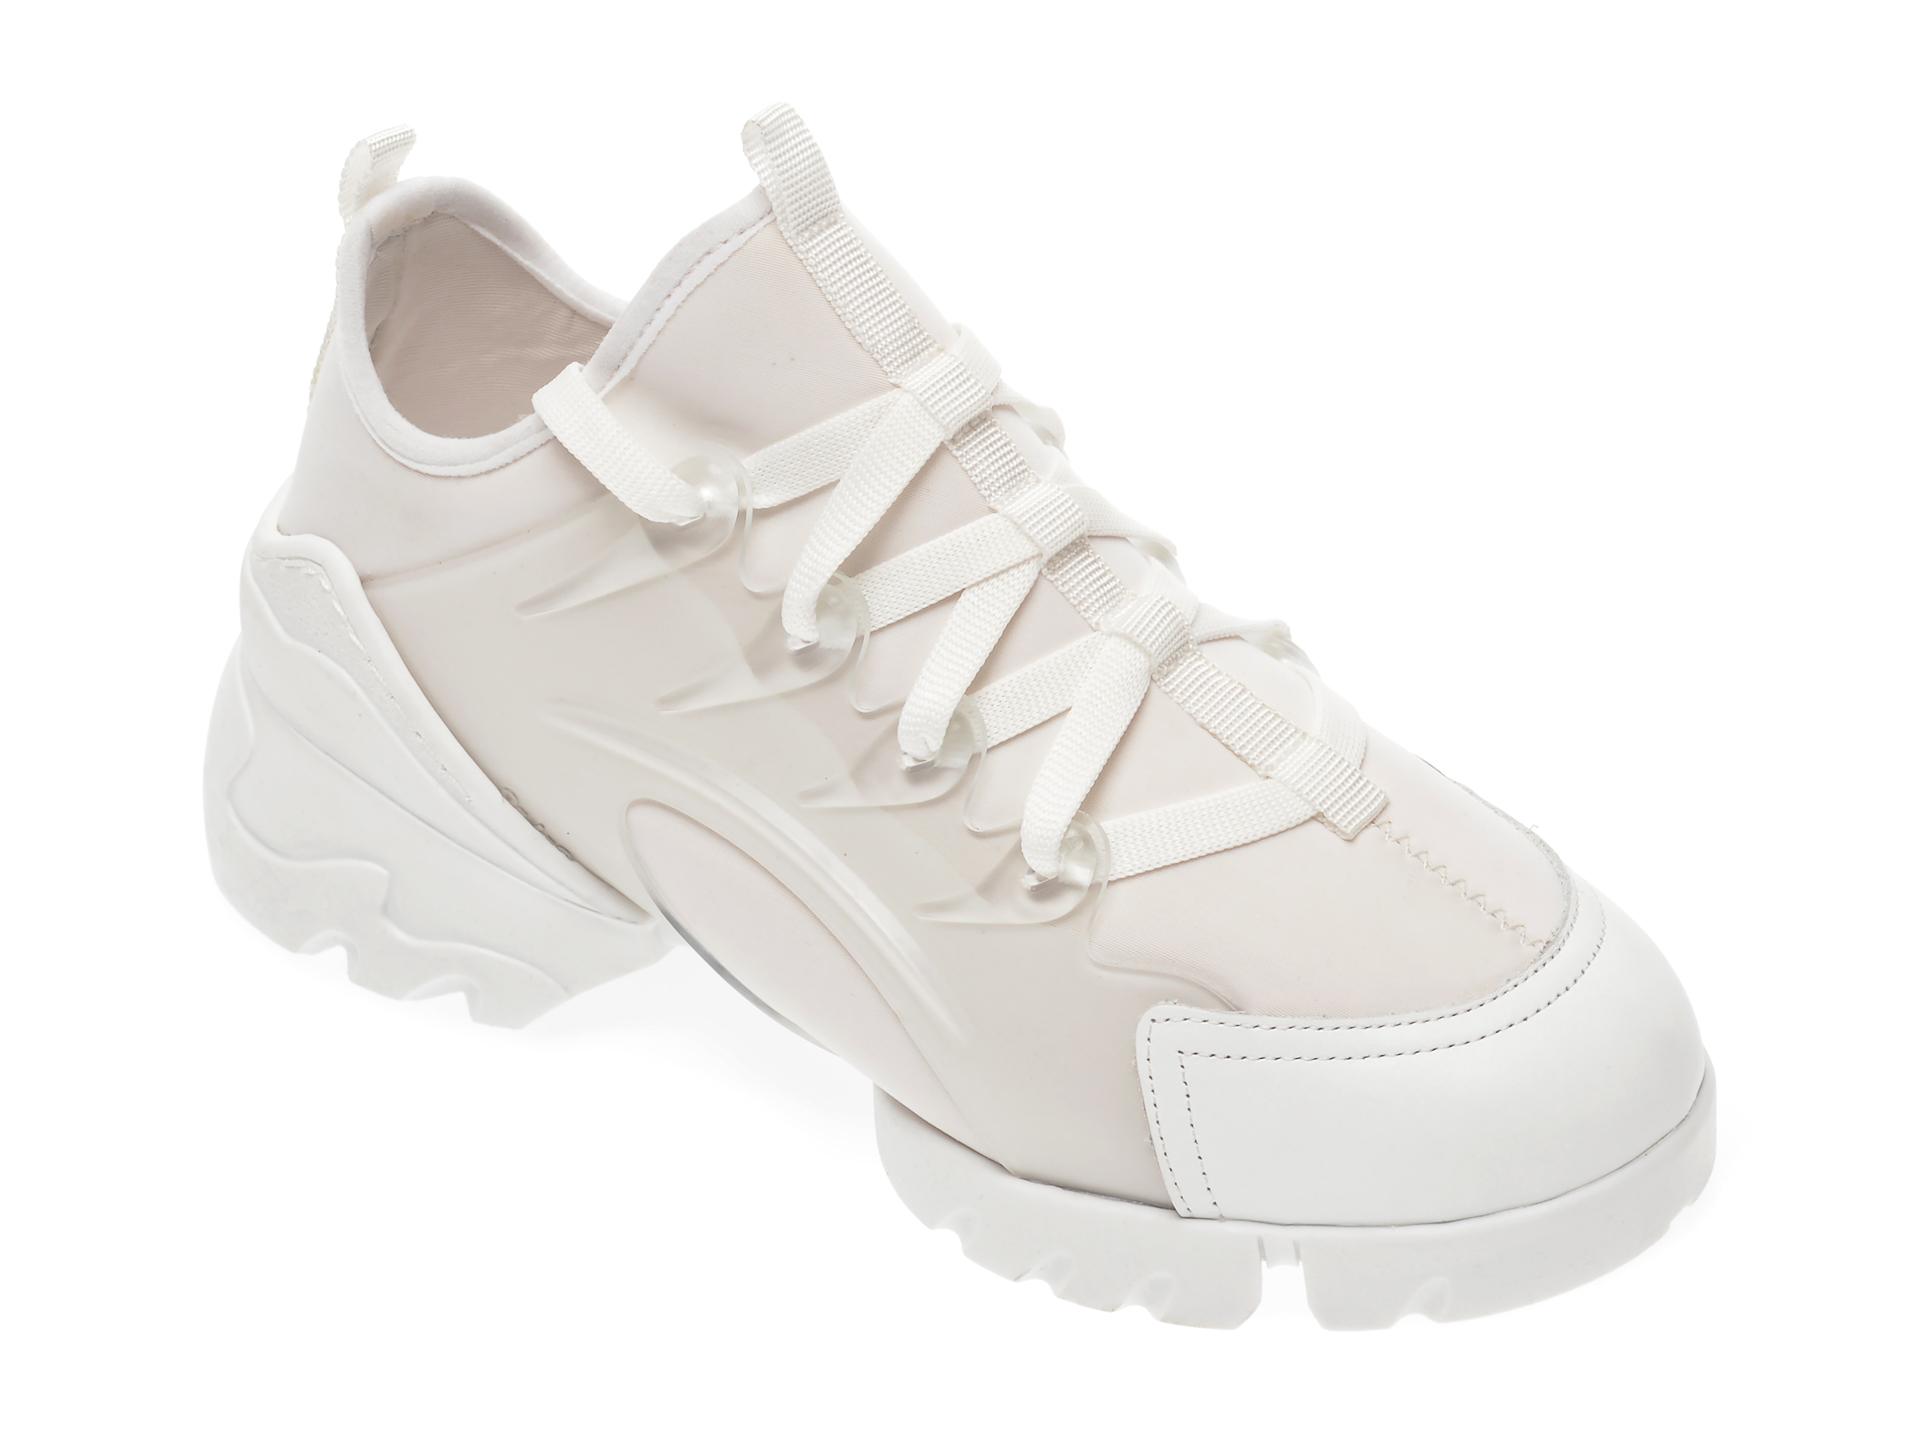 Pantofi sport GRYXX albi, MO1332, din material textil si piele ecologica